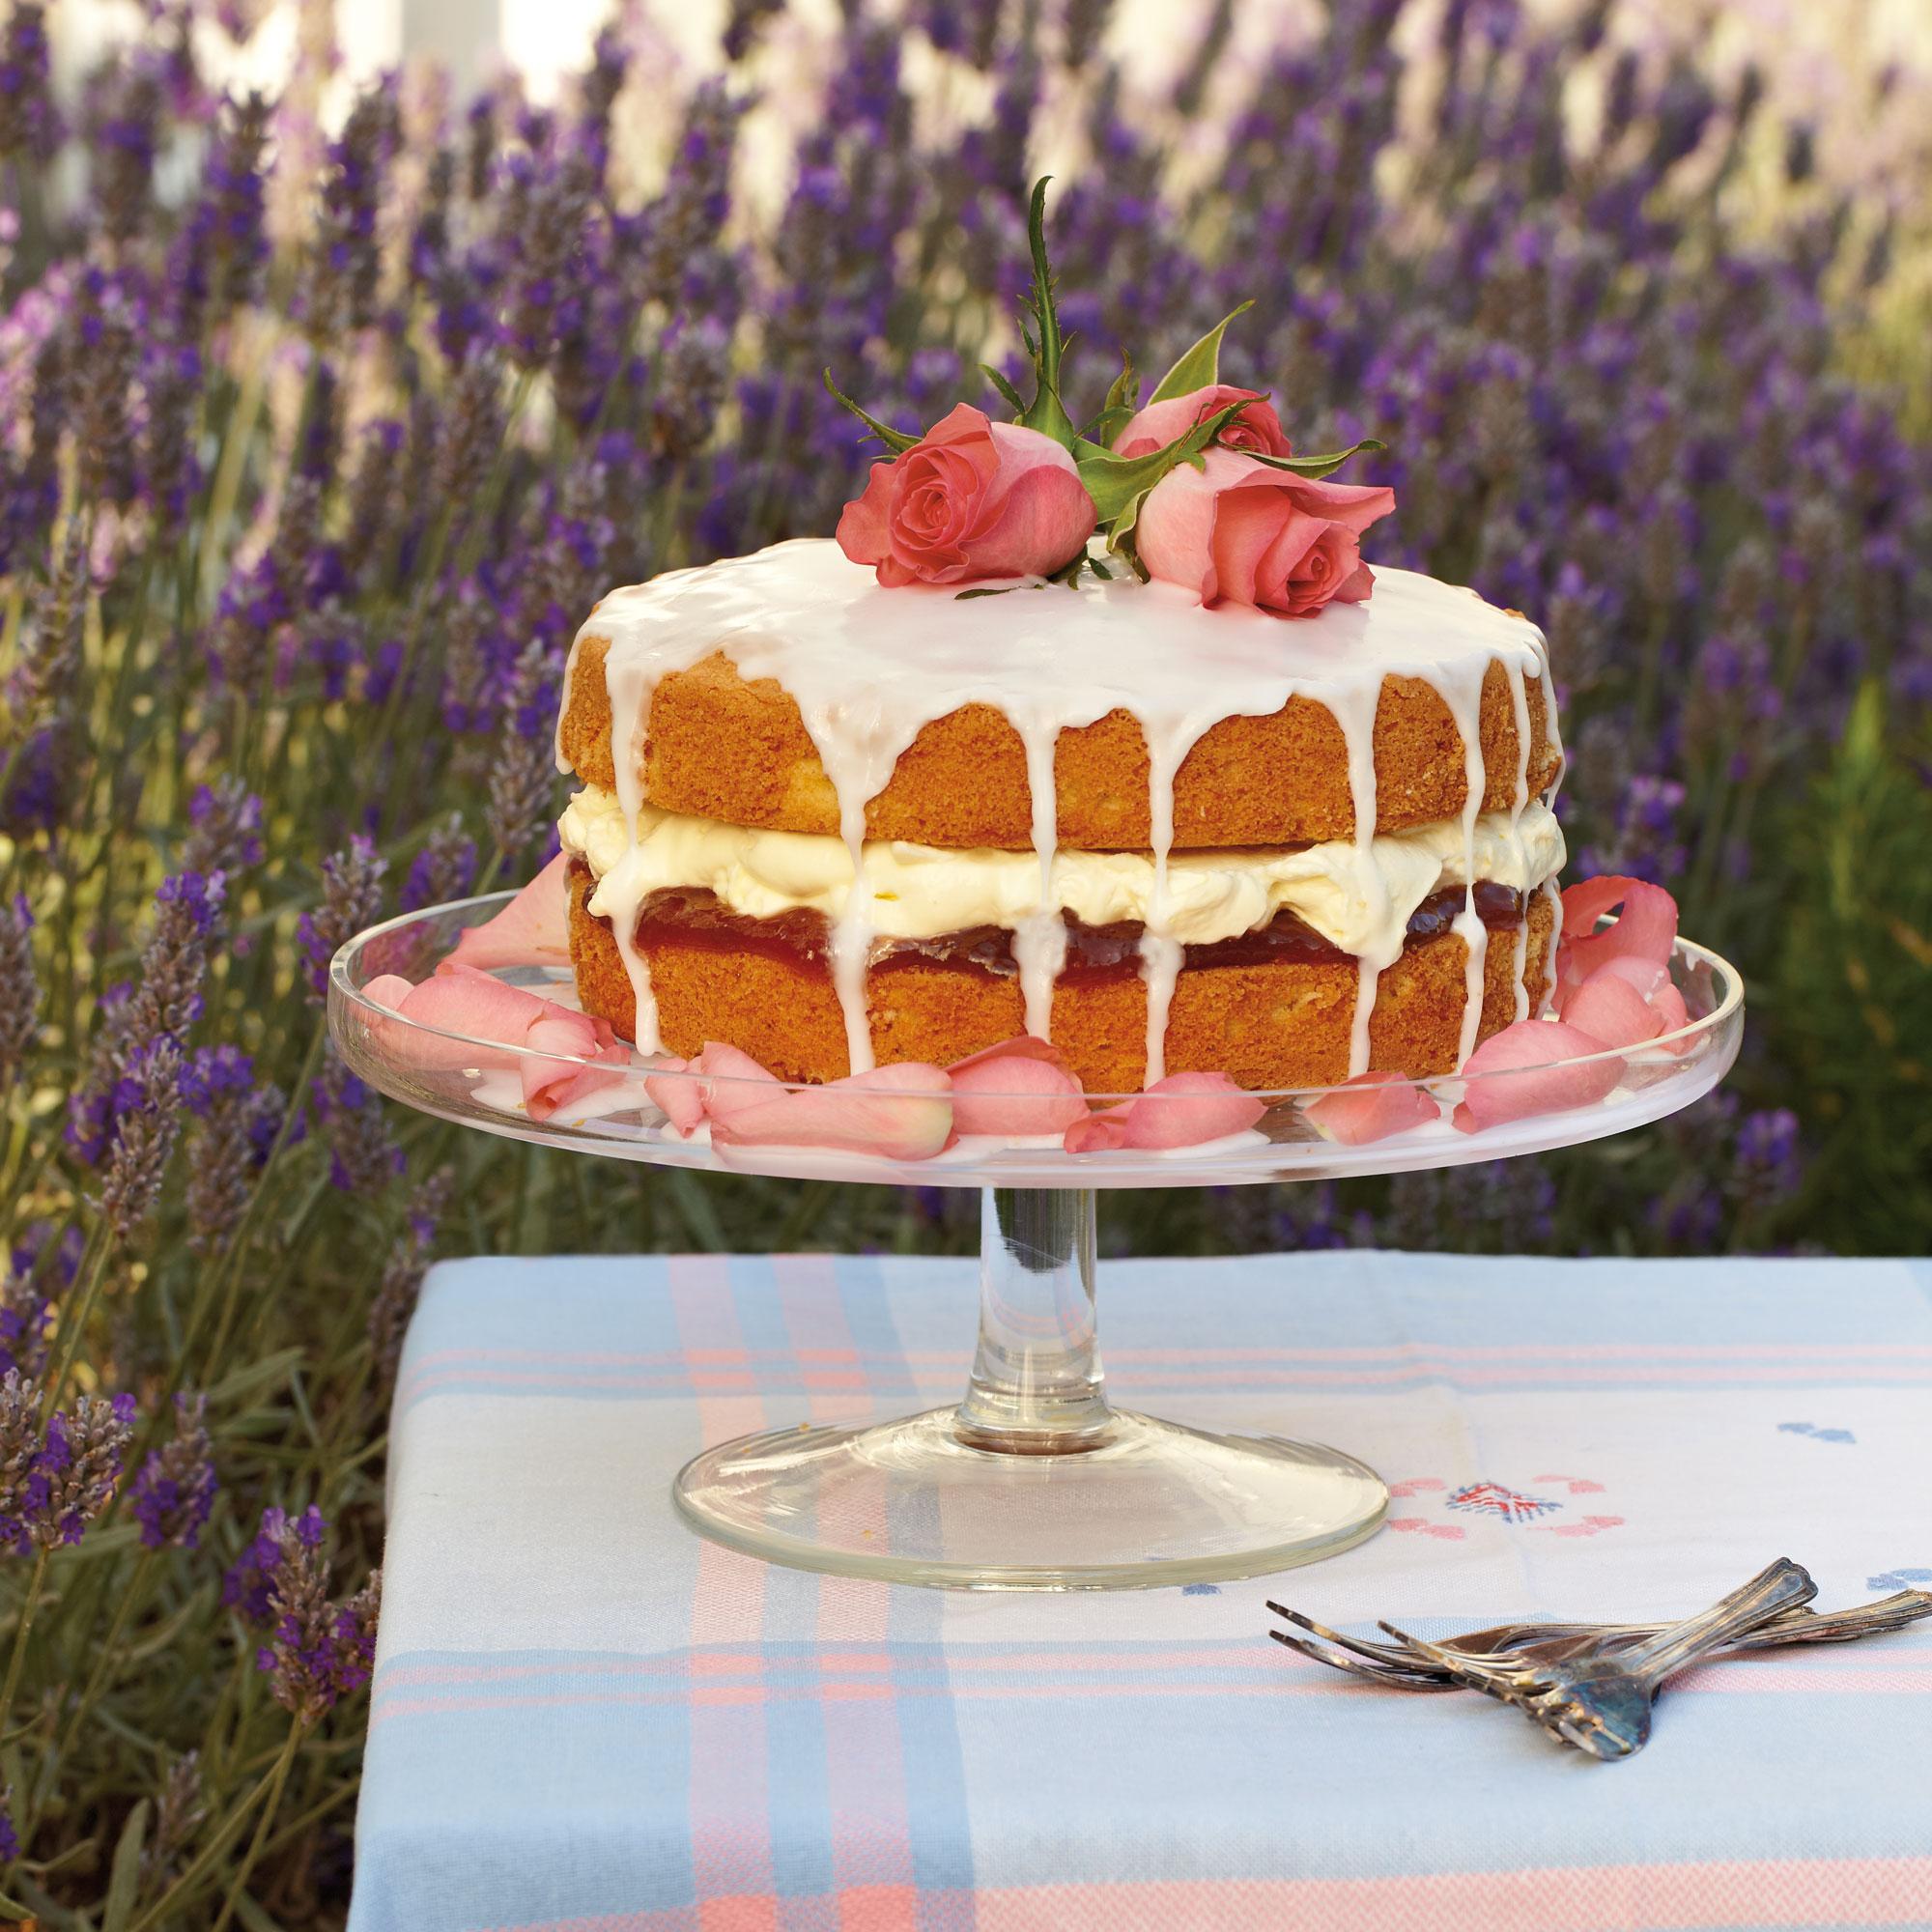 Special Occasion Cake Recipes Uk